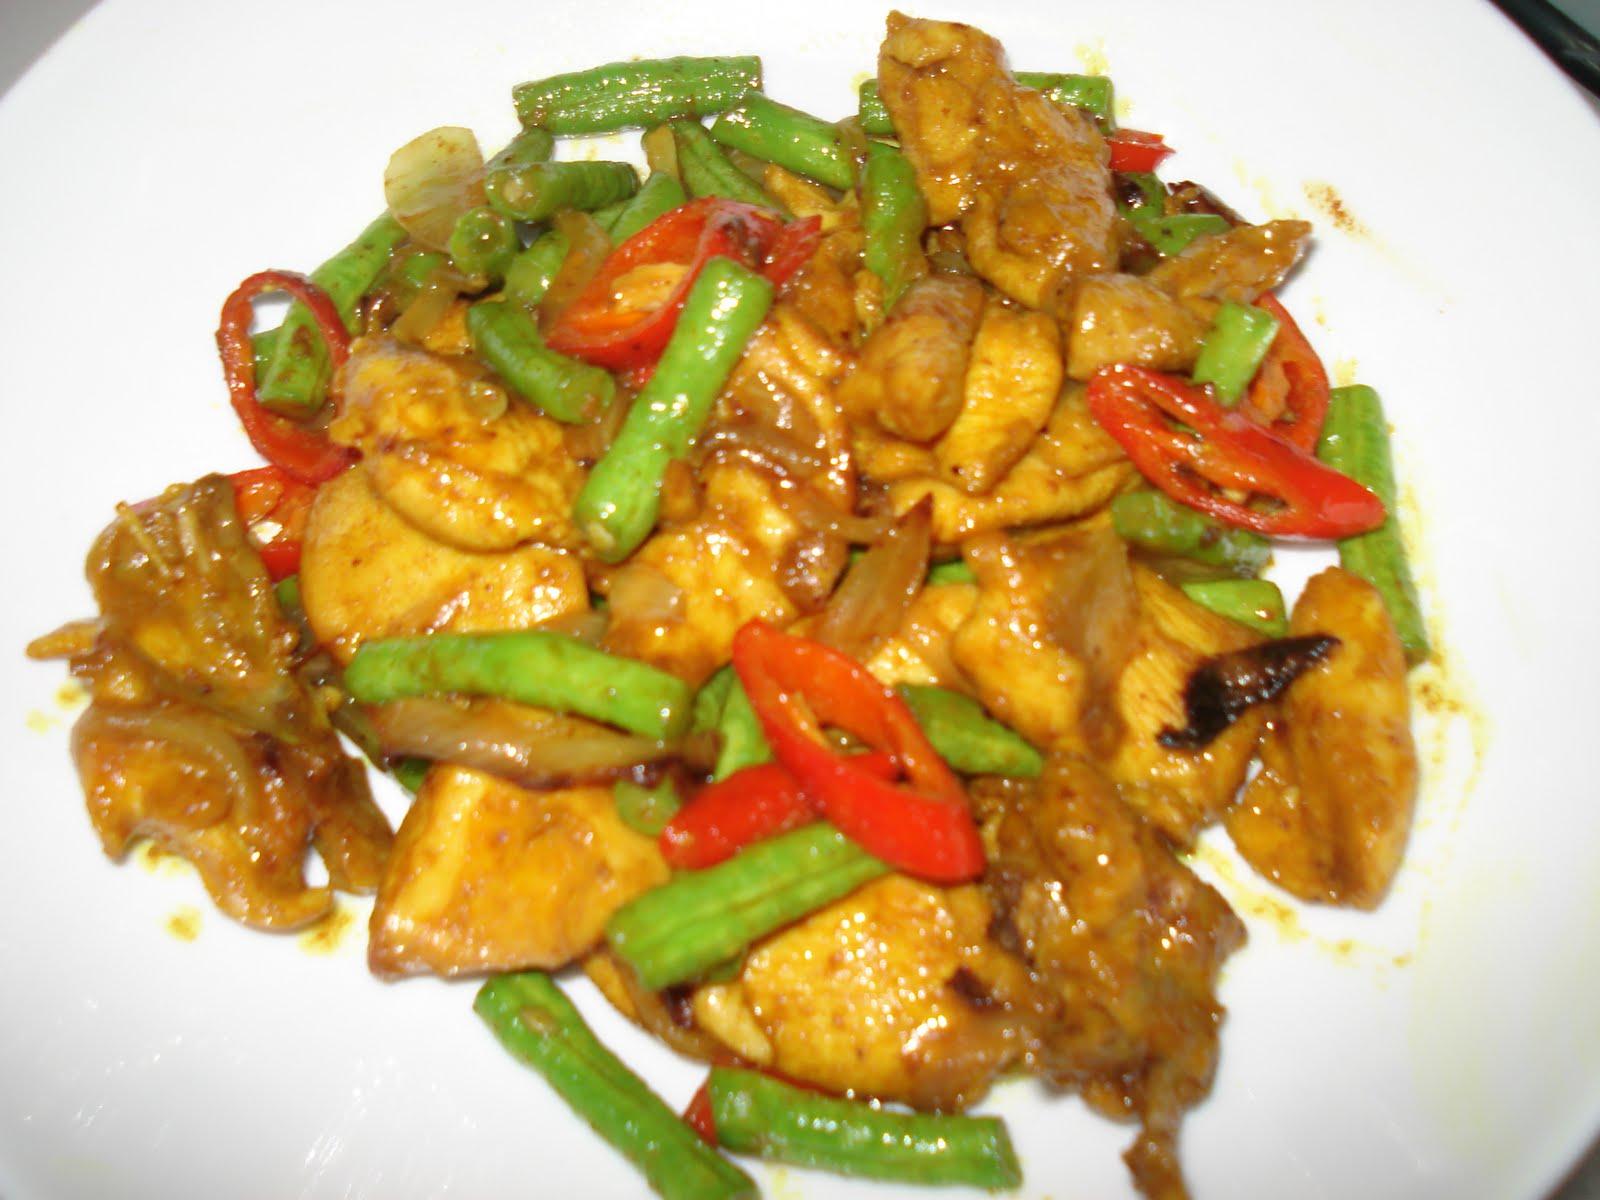 ayam goreng kunyit resipi simple  sedikit diketahui  blogopsi Resepi Masakan Ayam Belanda Enak dan Mudah